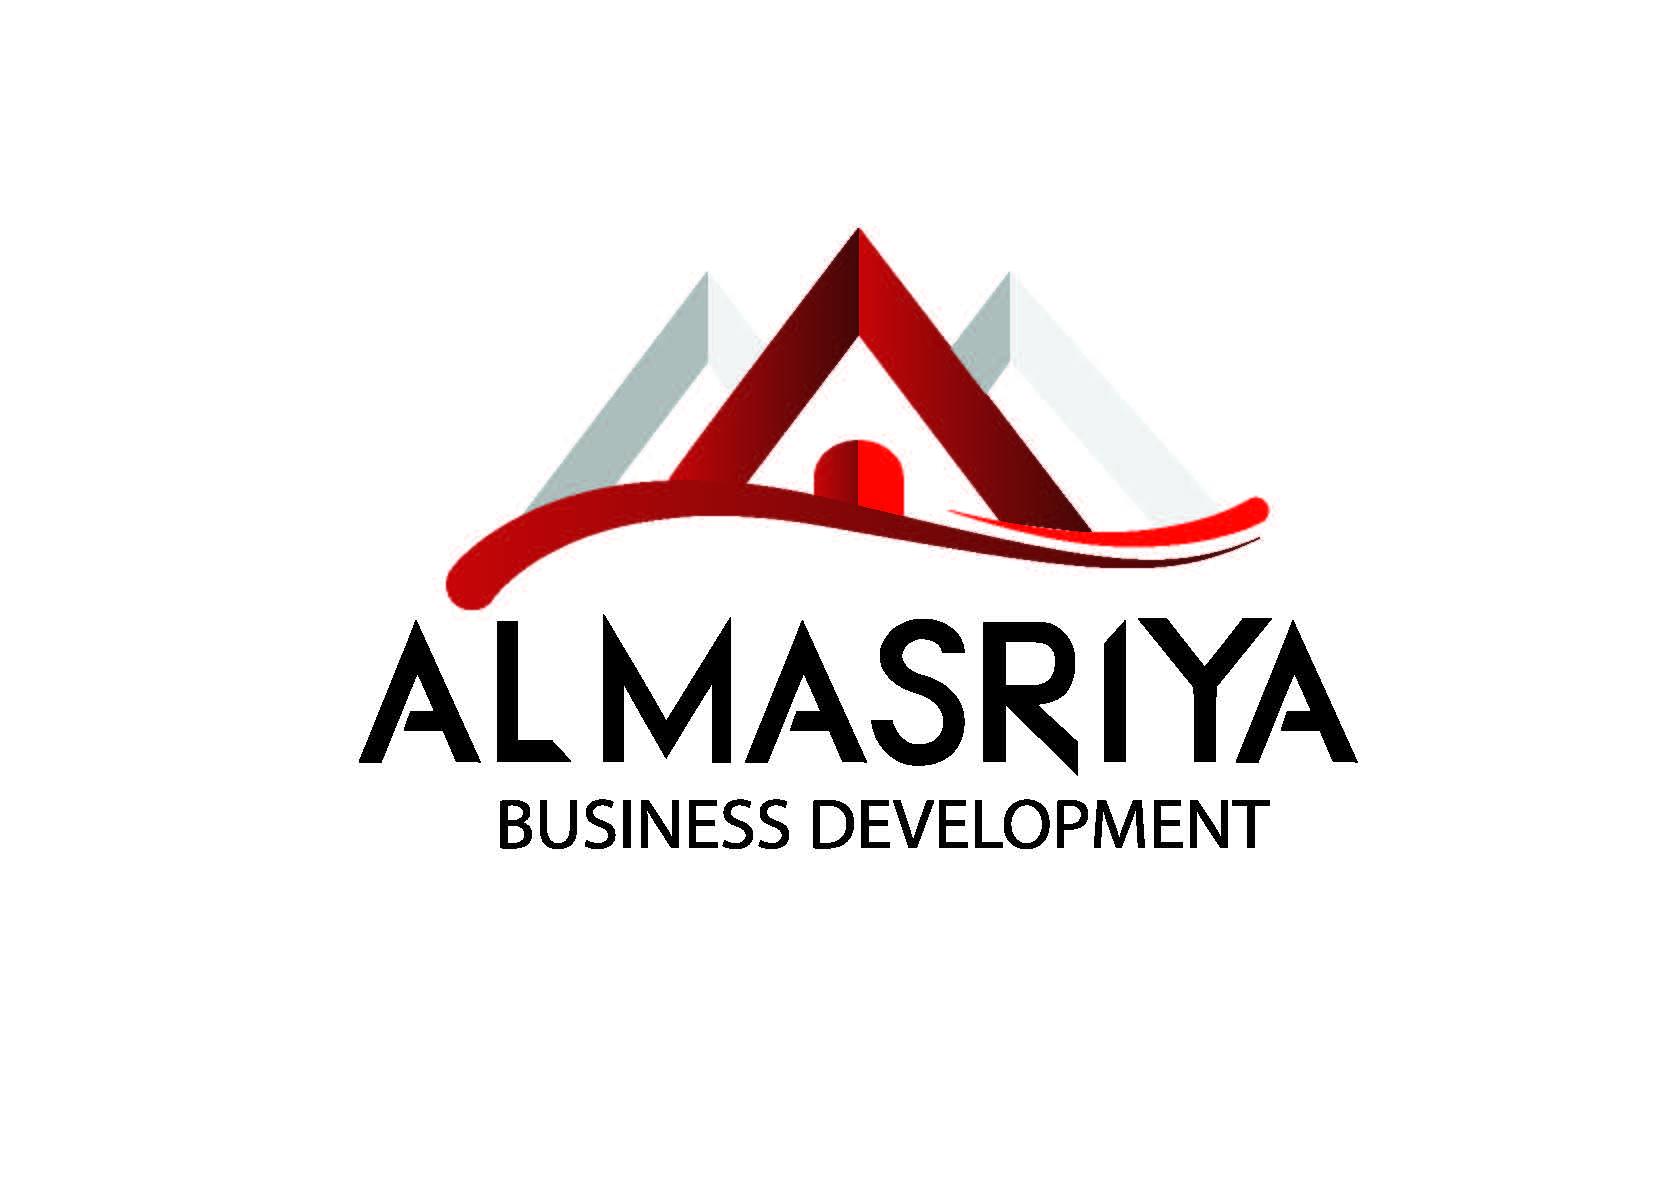 almasriya logo